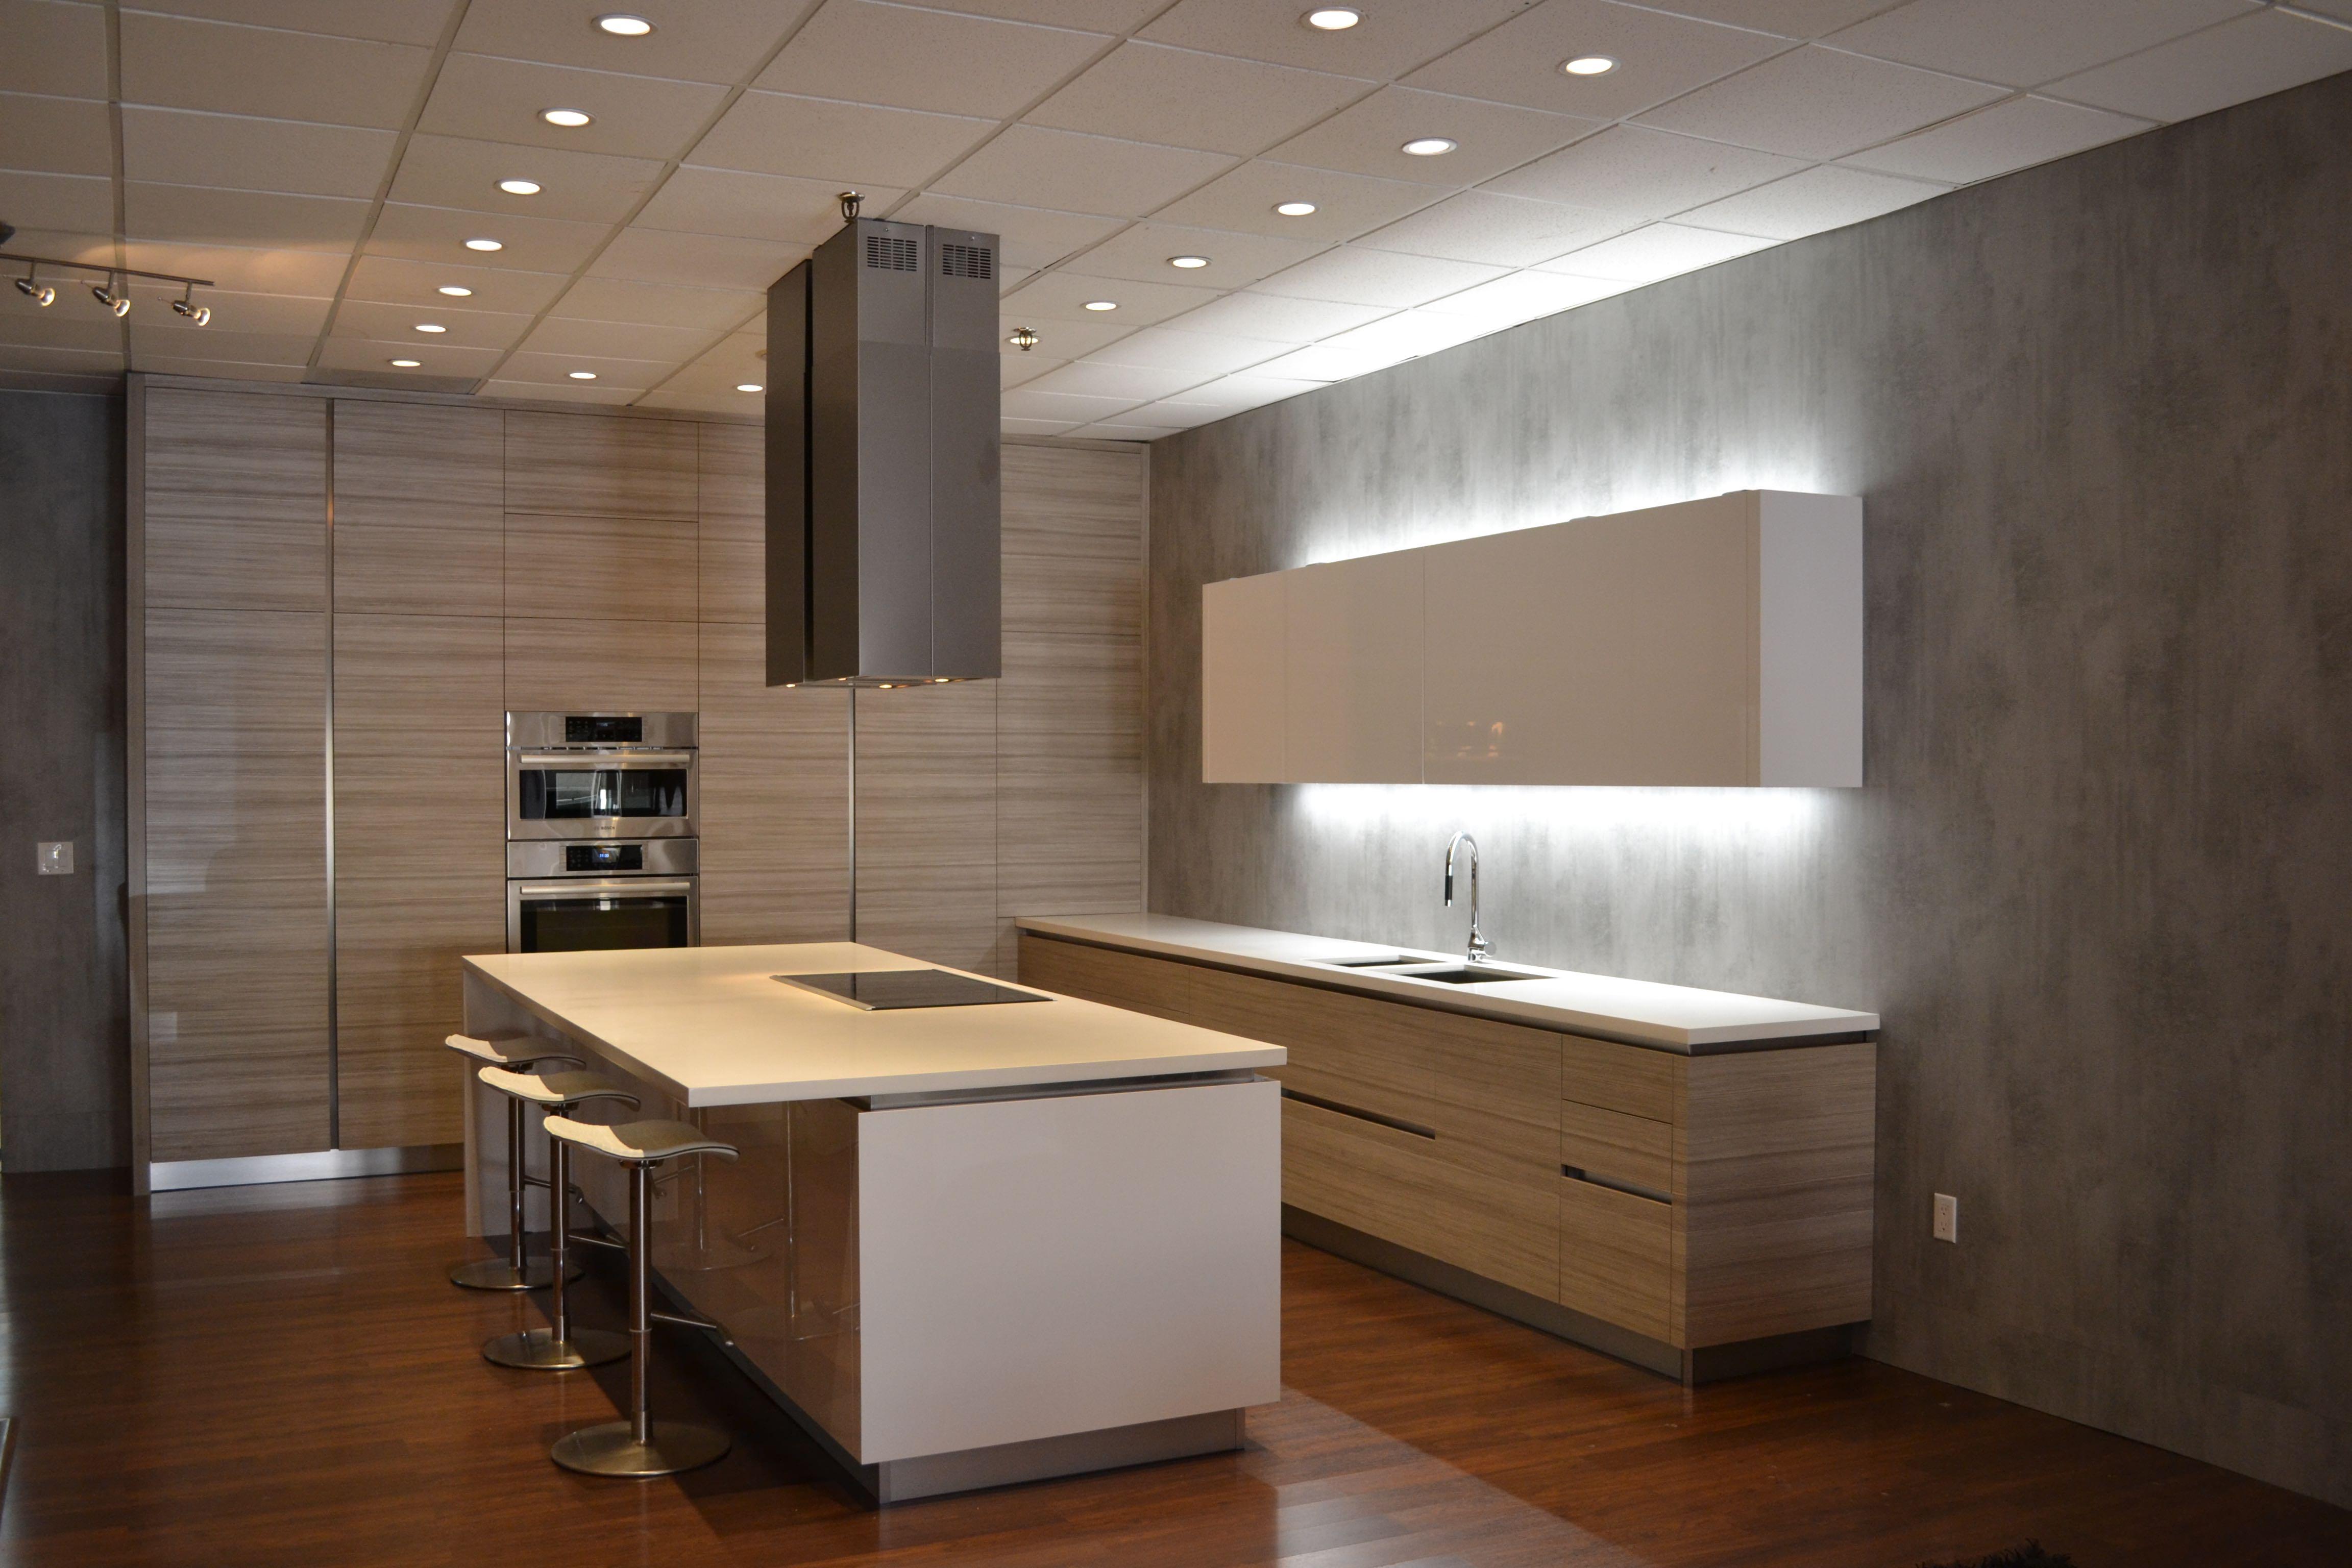 Cabinet Doors Textured Laminate Laminate Kitchen Cabinets A Modern Kitchen  With LK55 Etobicoke Textured Laminate Cabinet